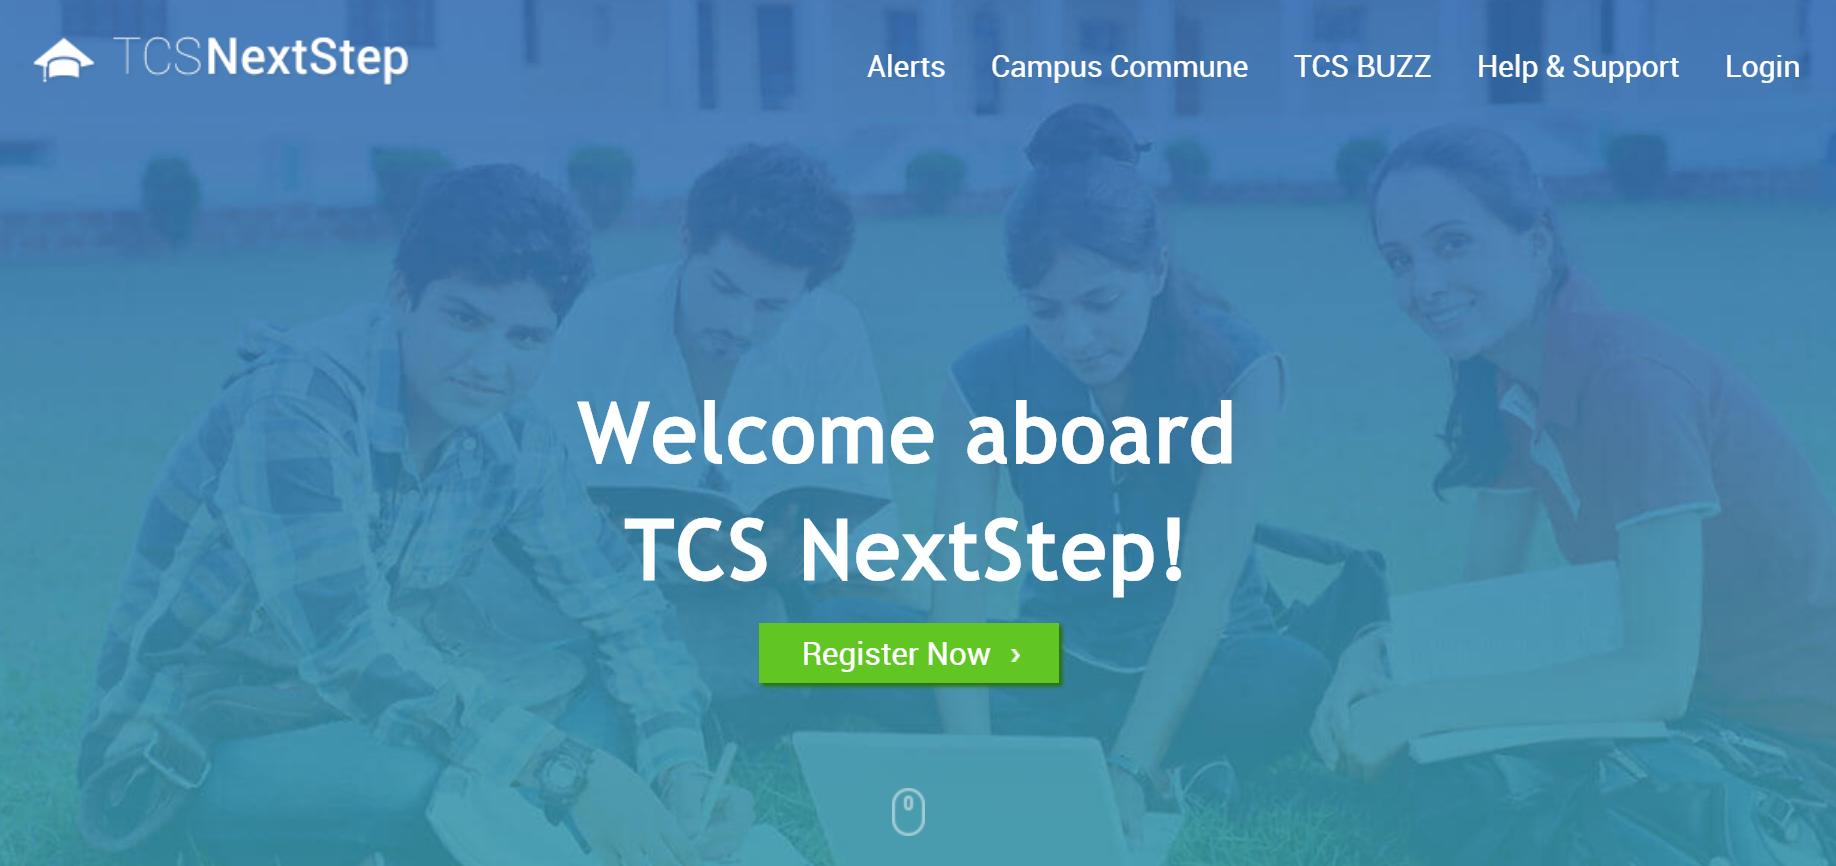 tcs next step registration process